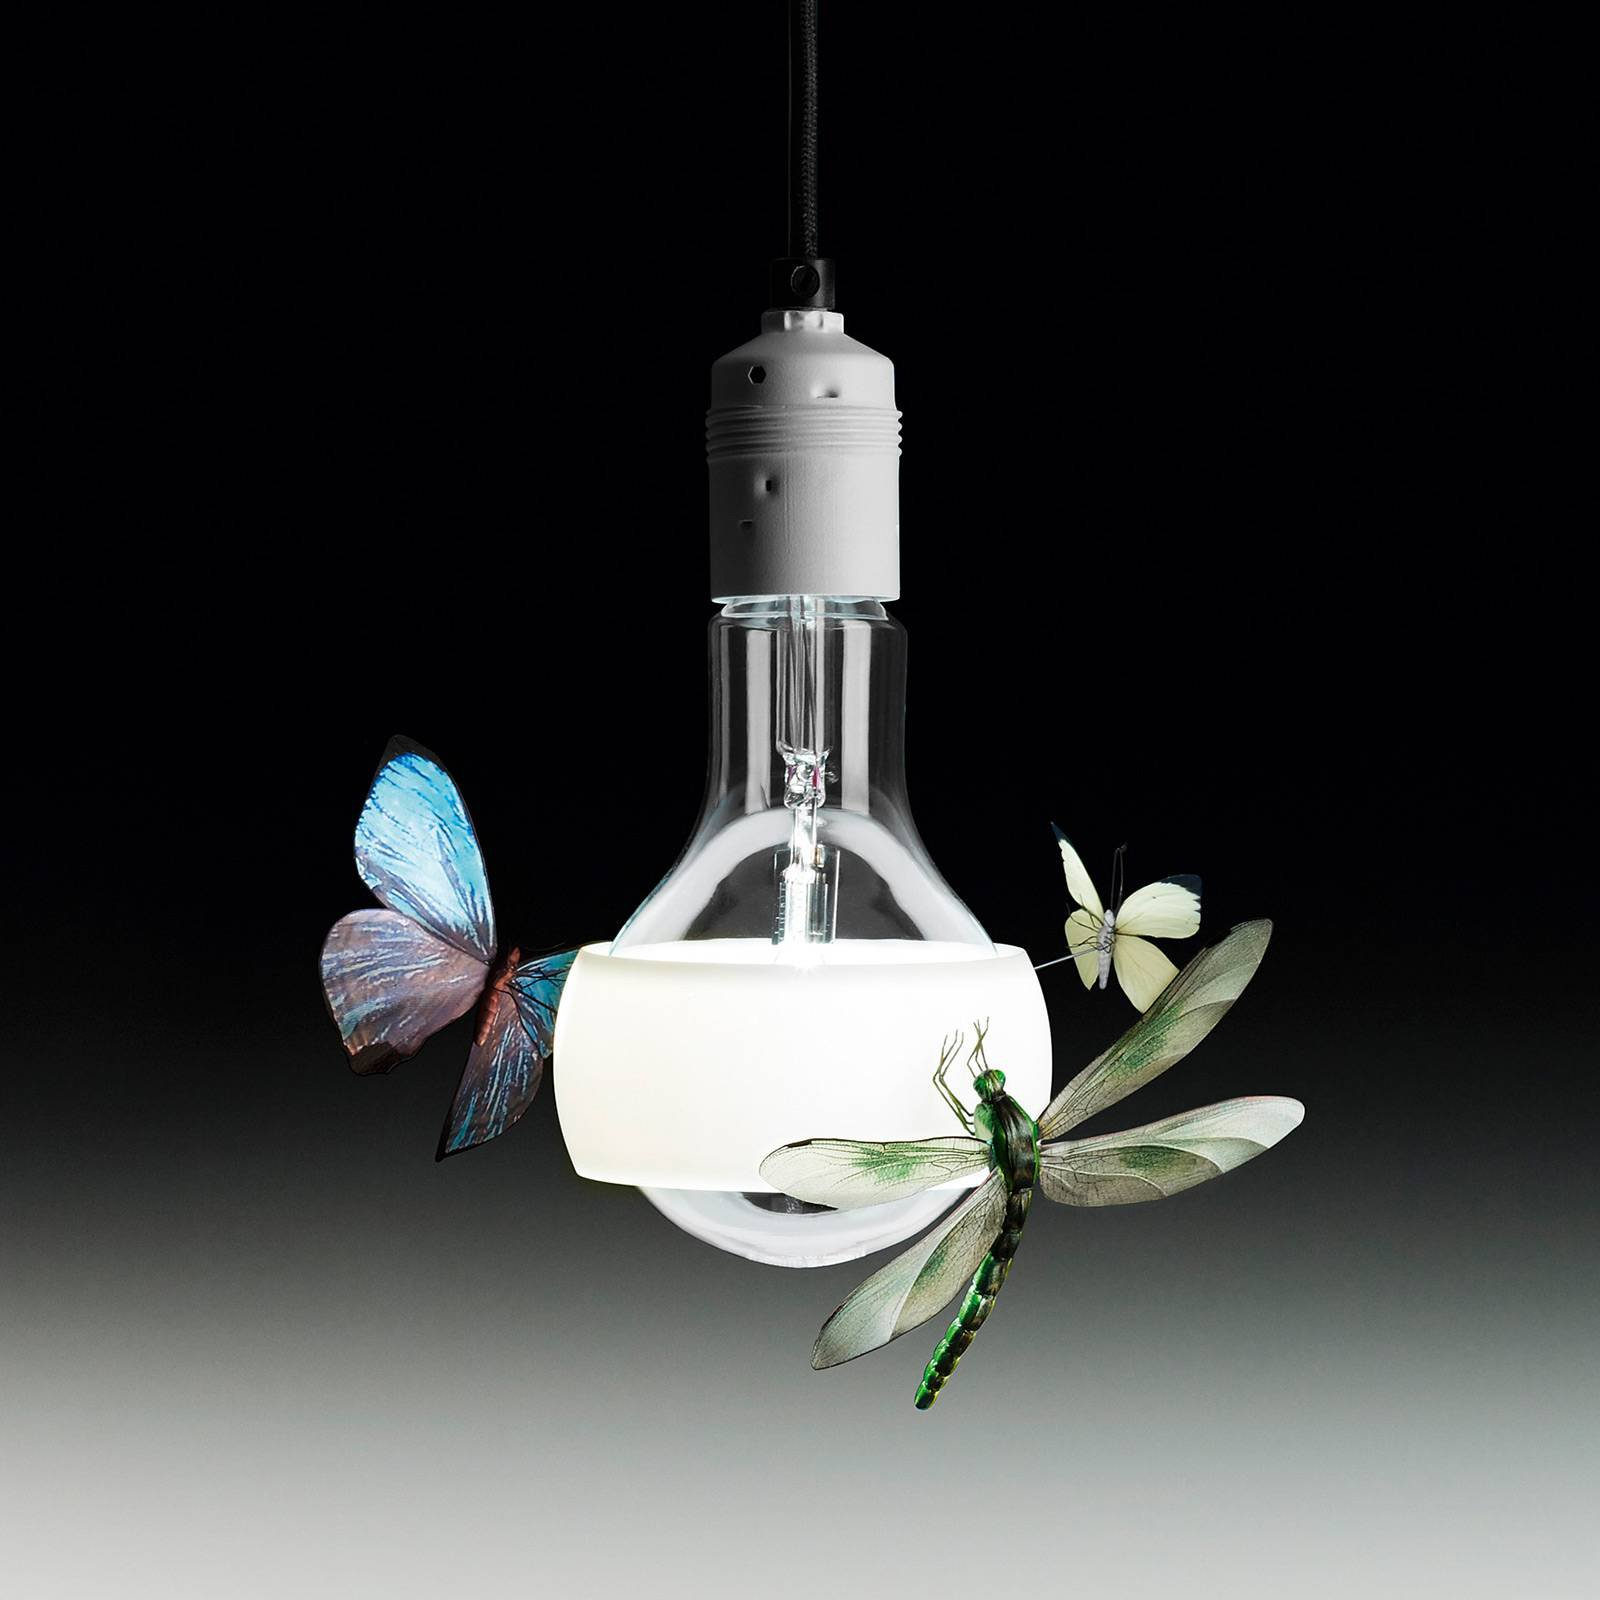 Ingo Maurer Johnny B. Butterfly hengelampe, 170 cm